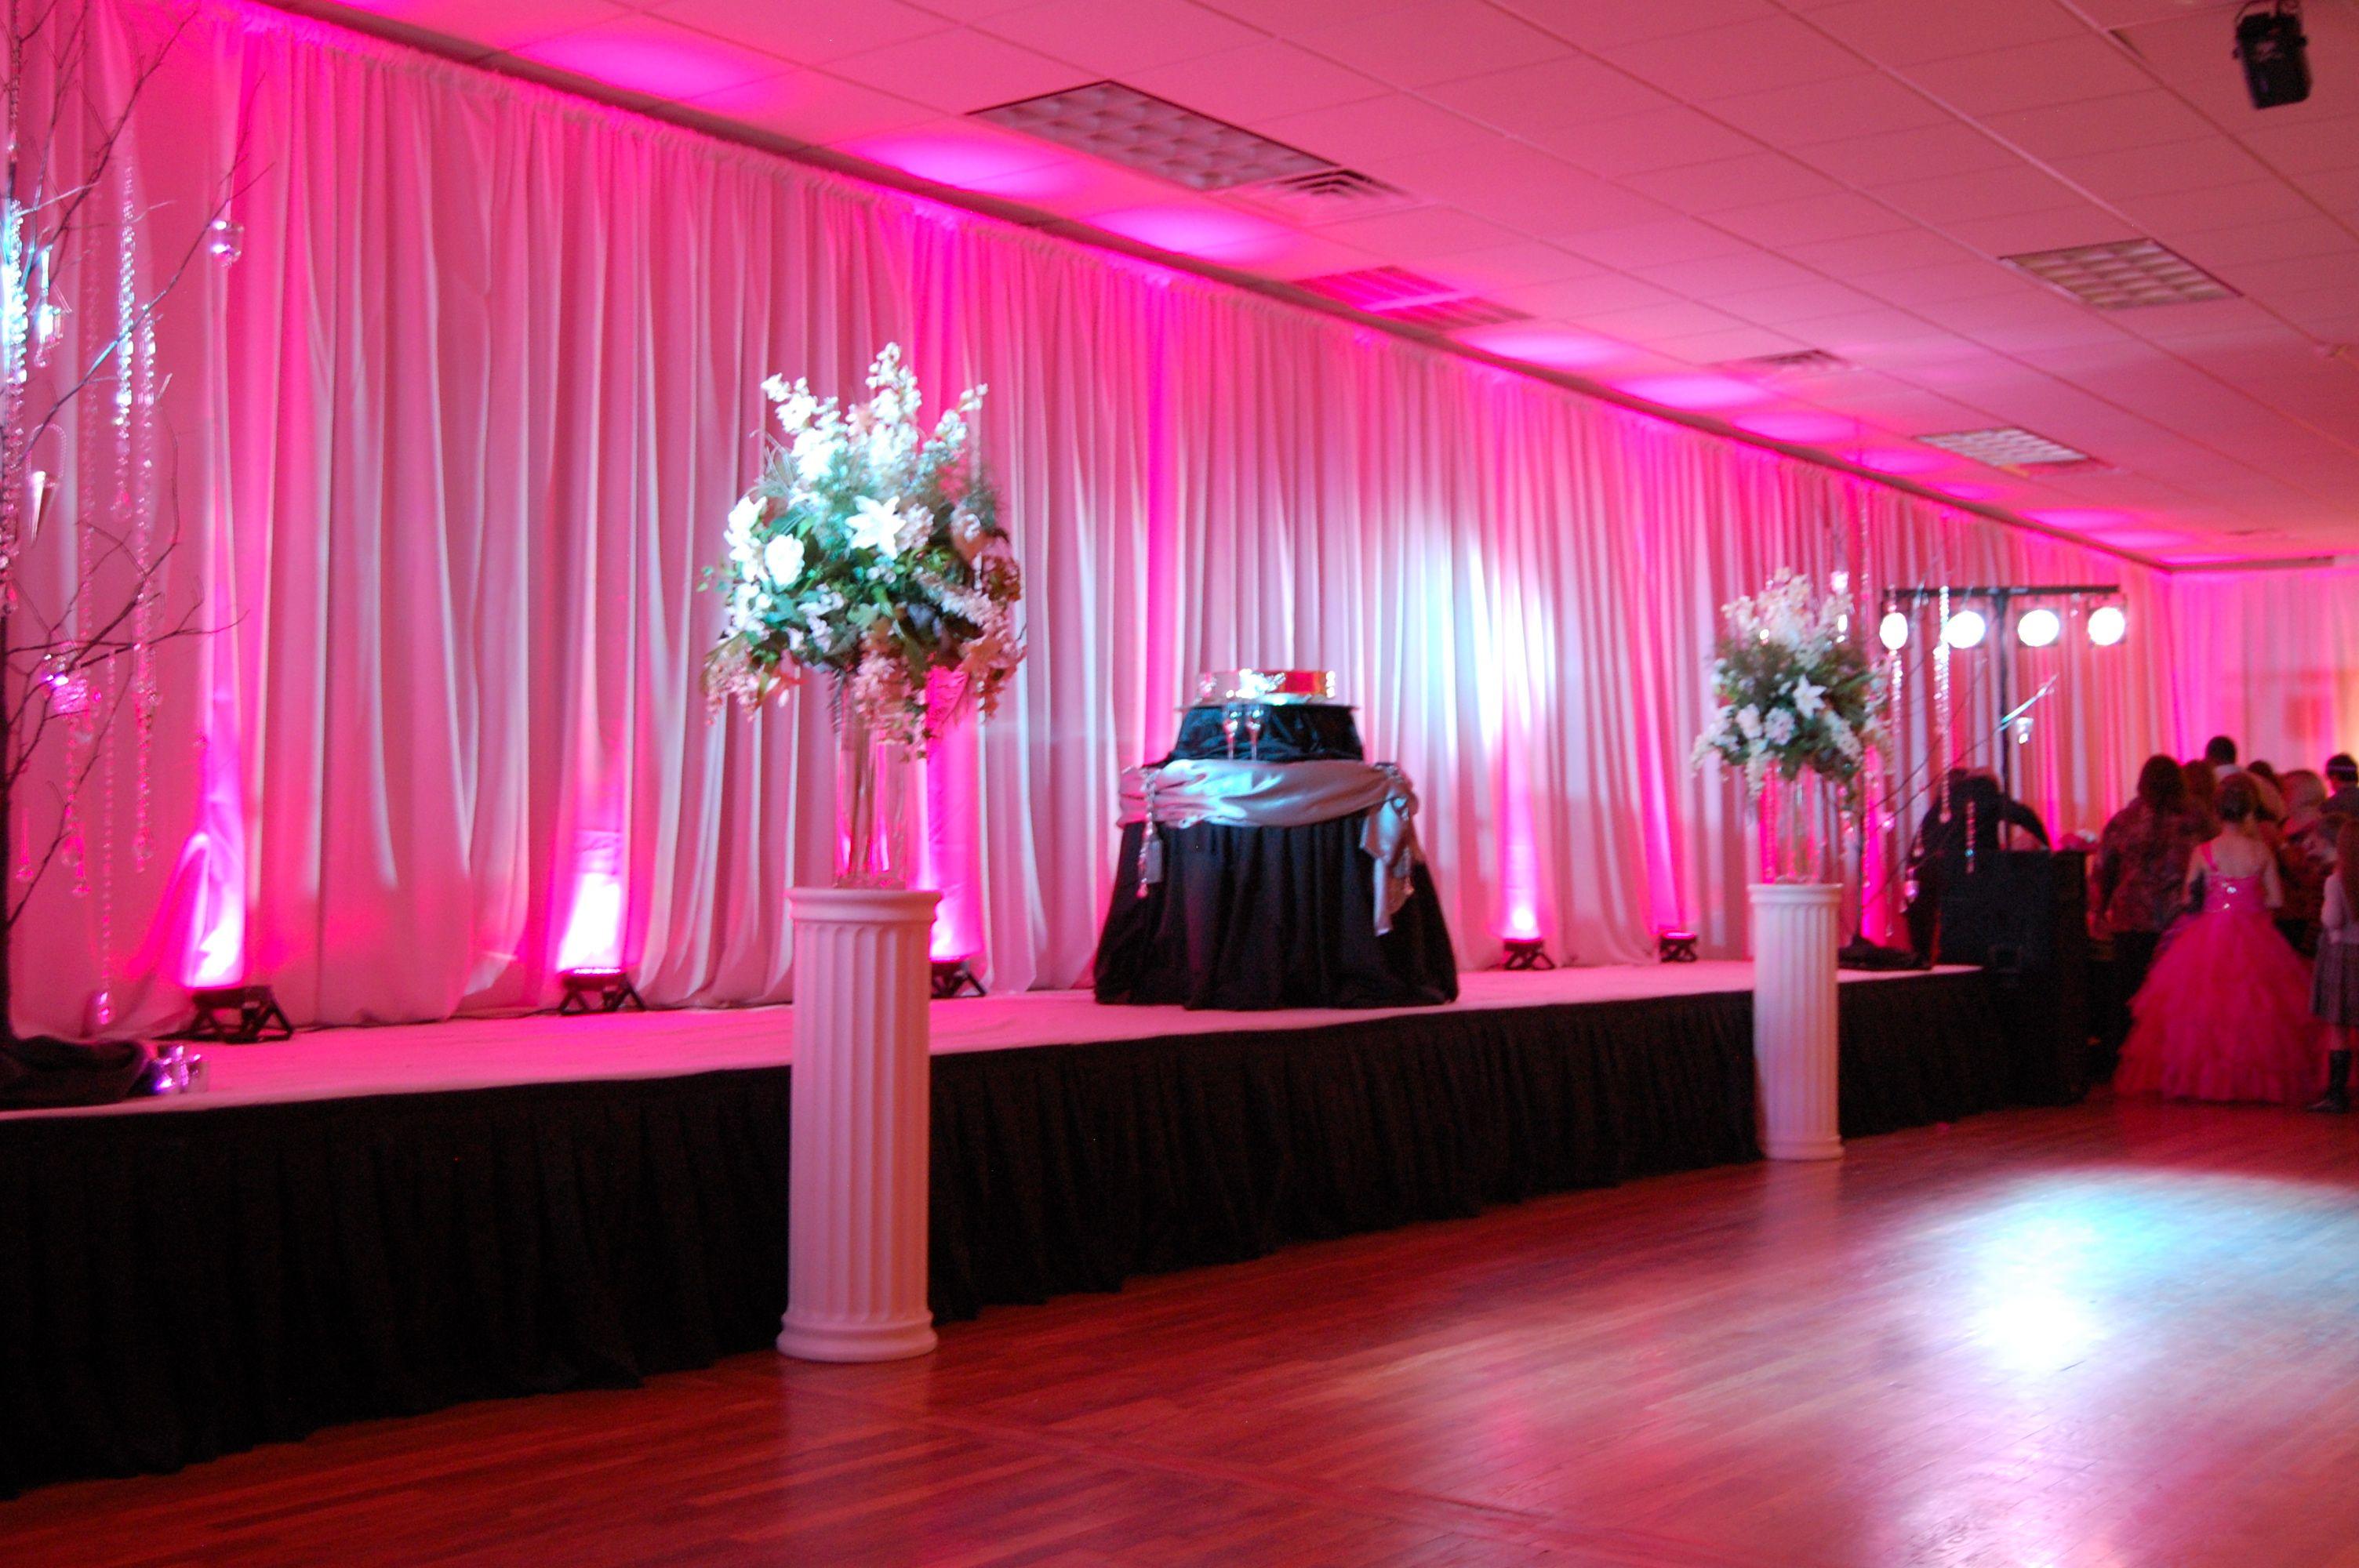 diy lighting for wedding. Pink #uplighting, A DIY Setup By The #bride\u0027s Mother! #RentMyWedding # Diy Lighting For Wedding E